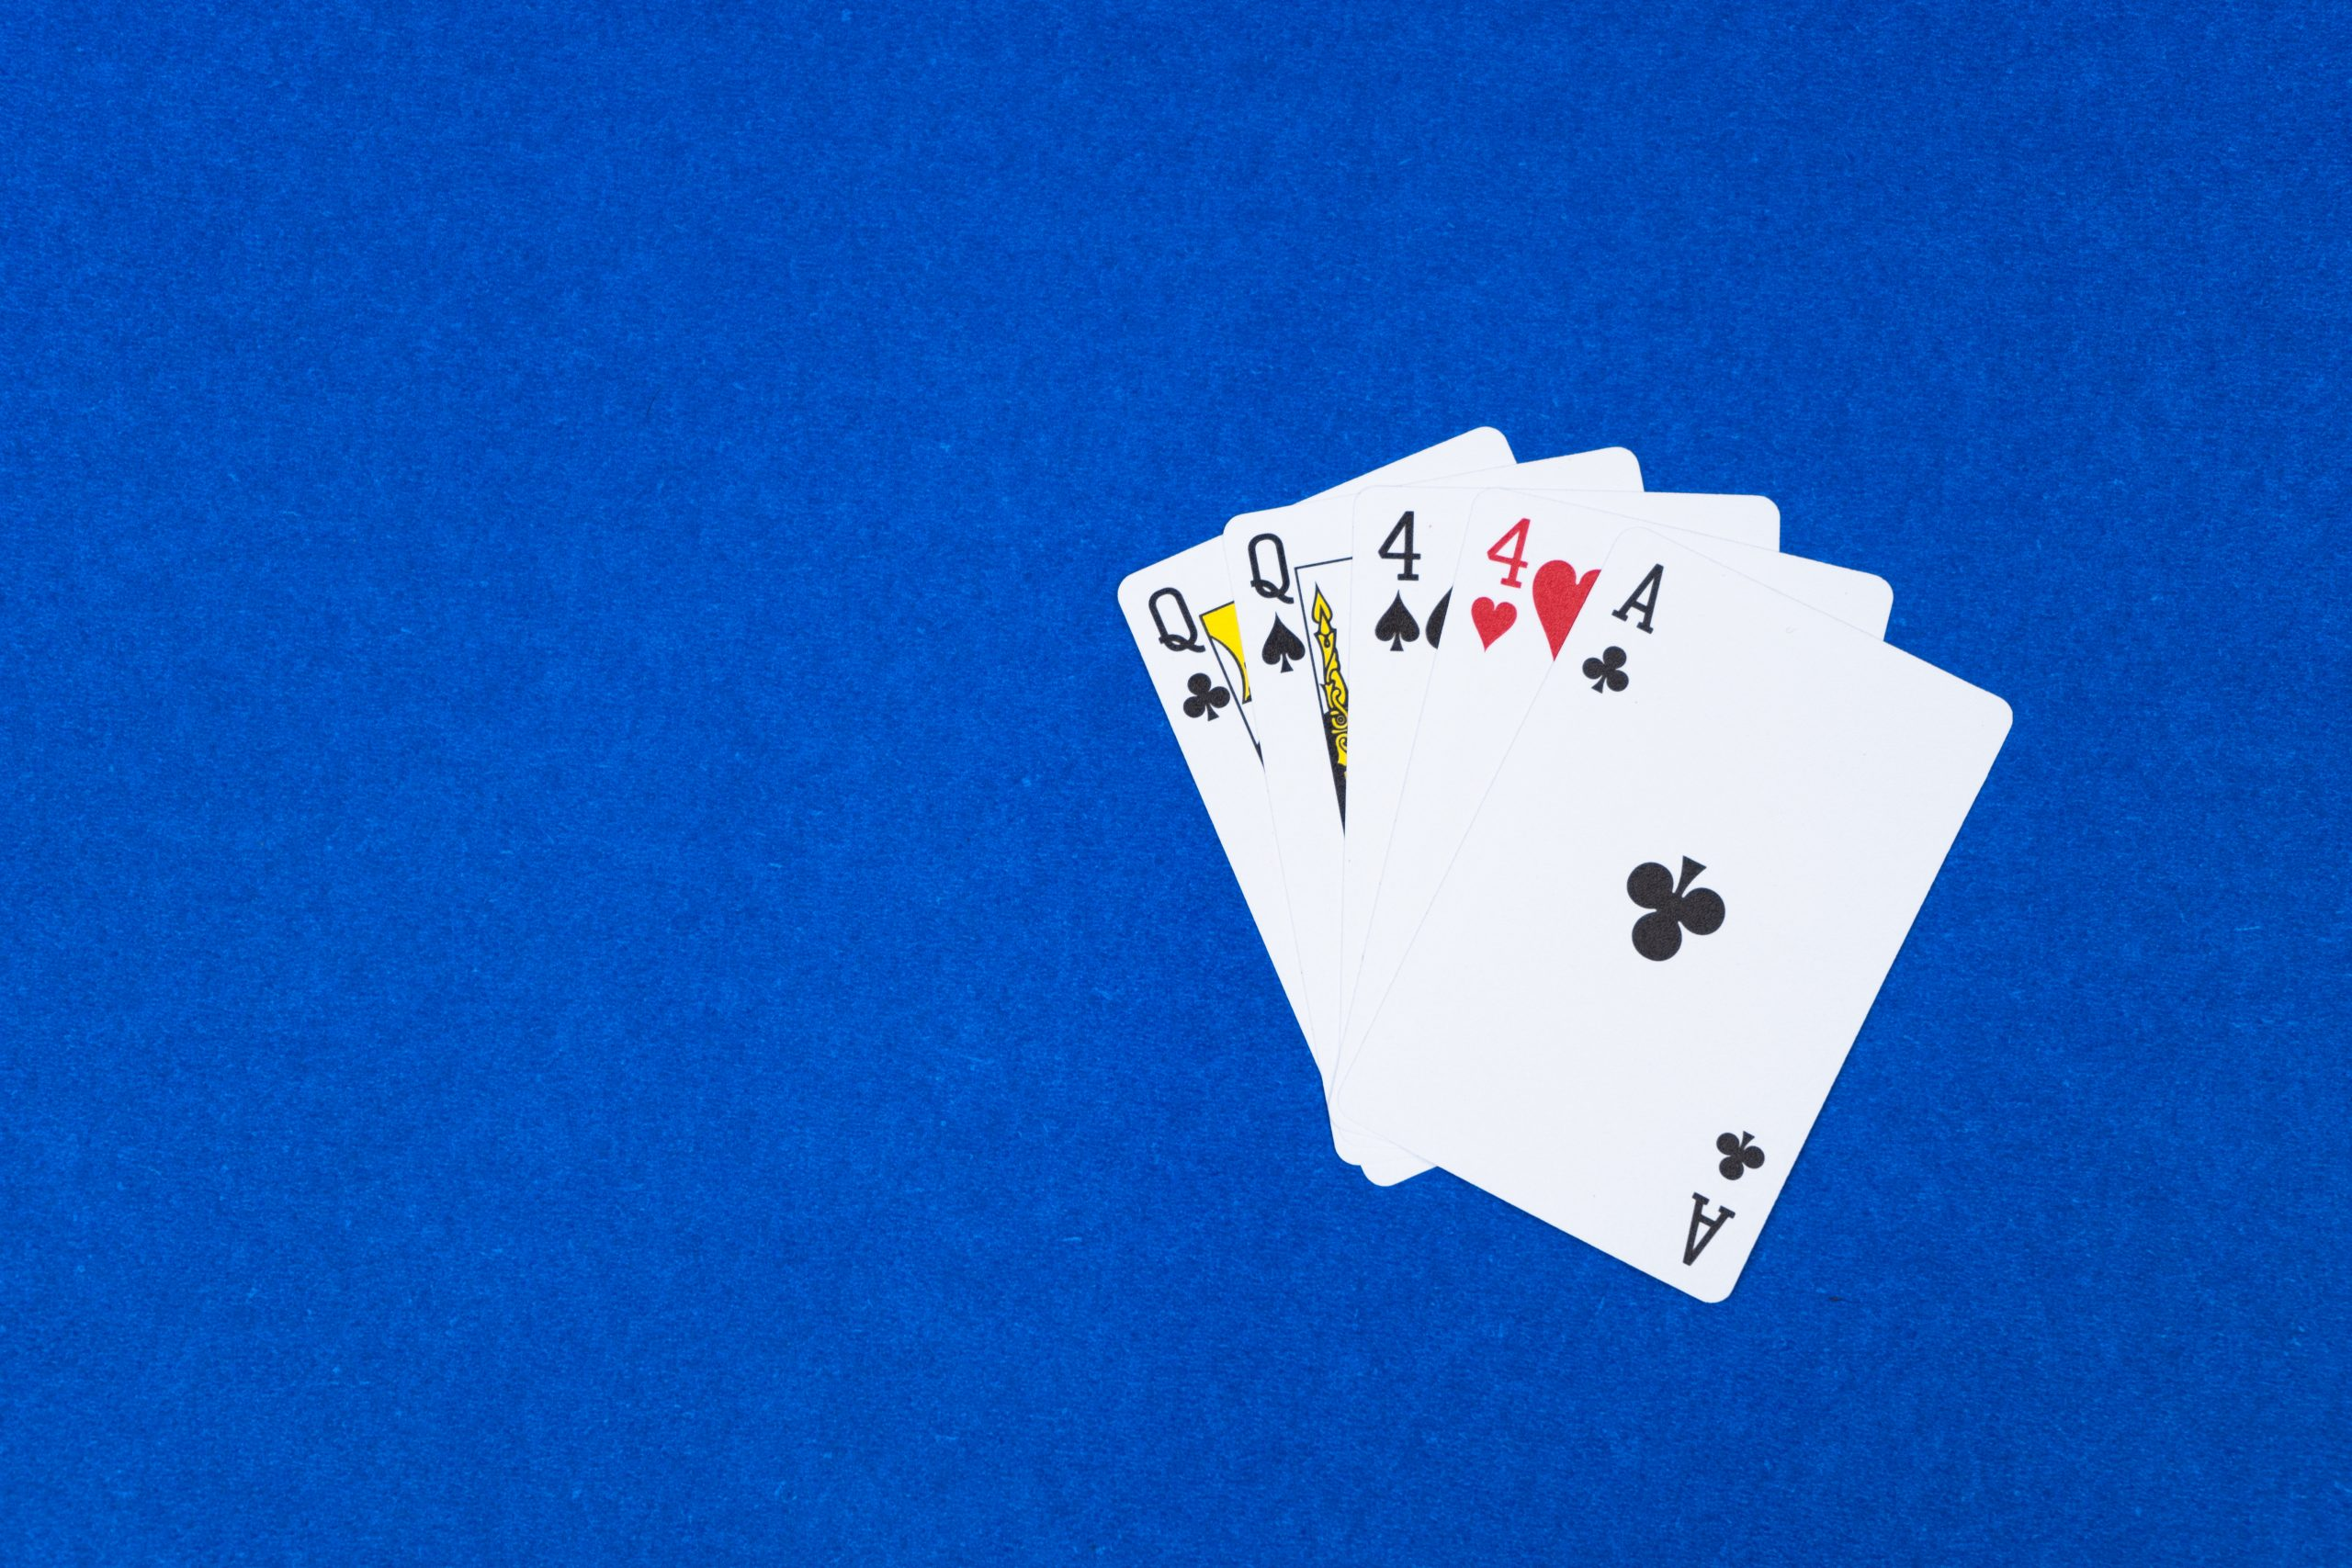 Poker Two Pair hand